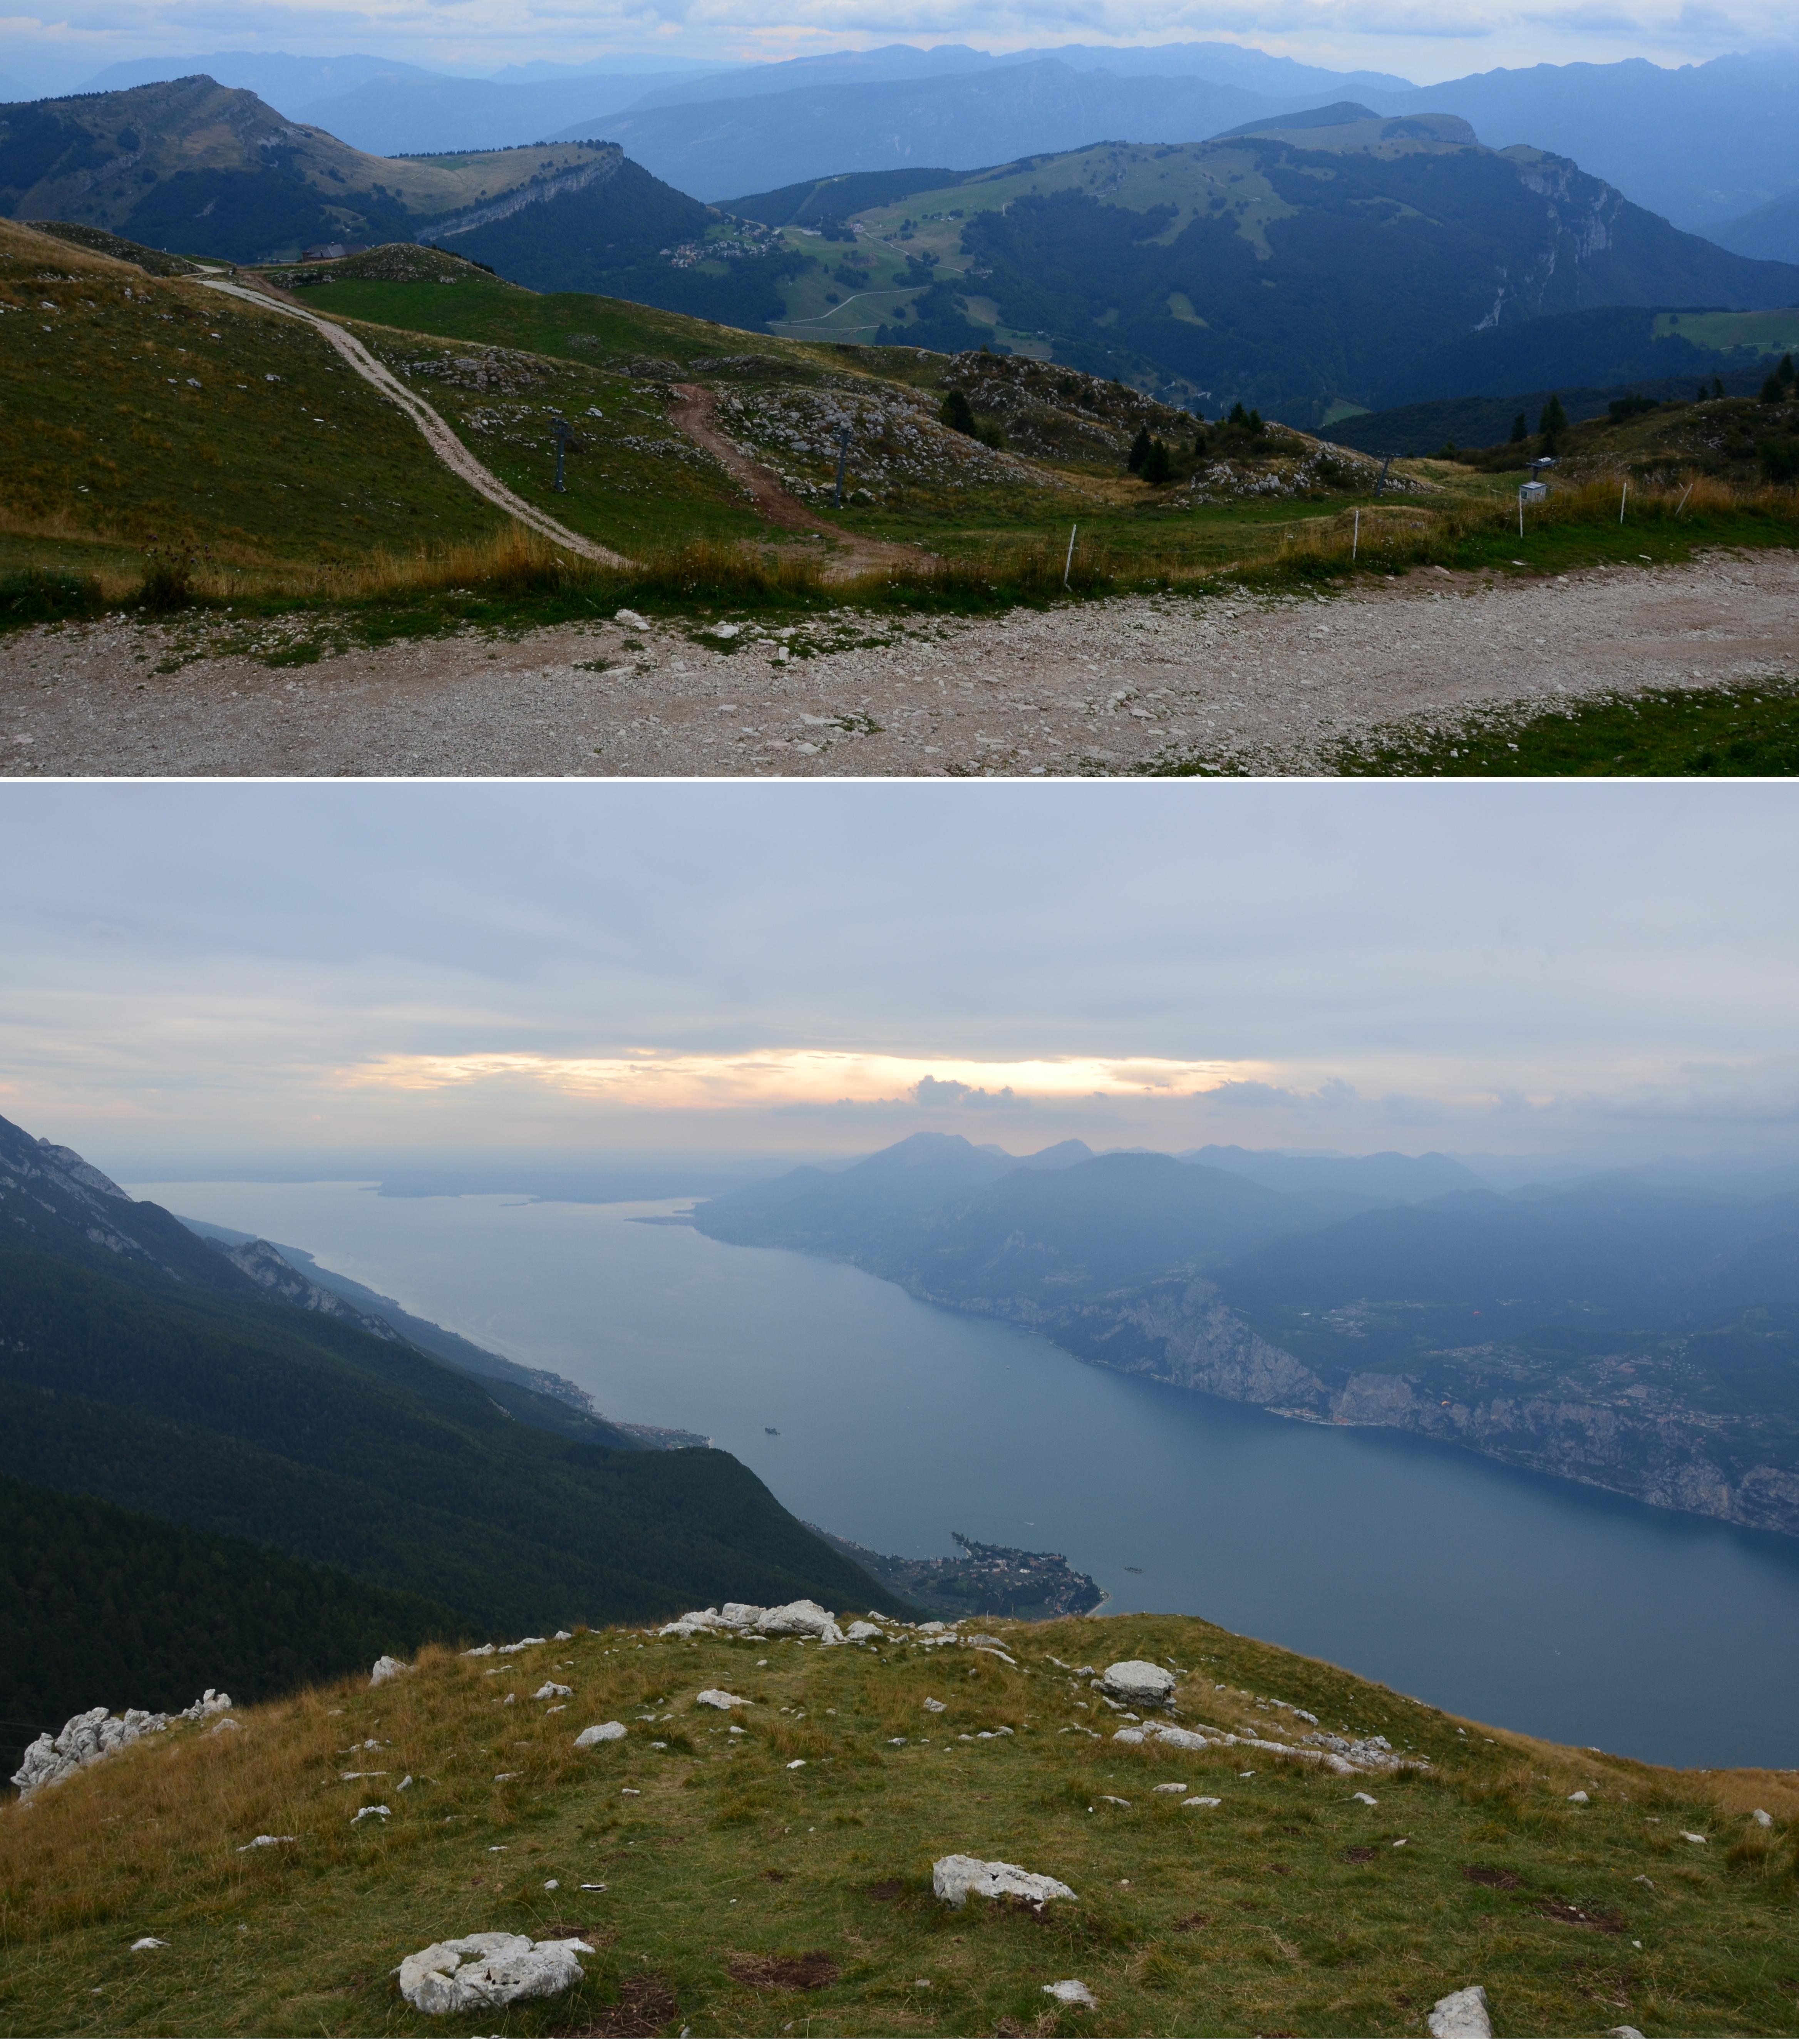 Pohoří Monte Balda (1650 m n. m.) a pohled na Lago di Garda (provincie Verona, Itálie), (Foto: K.K.)